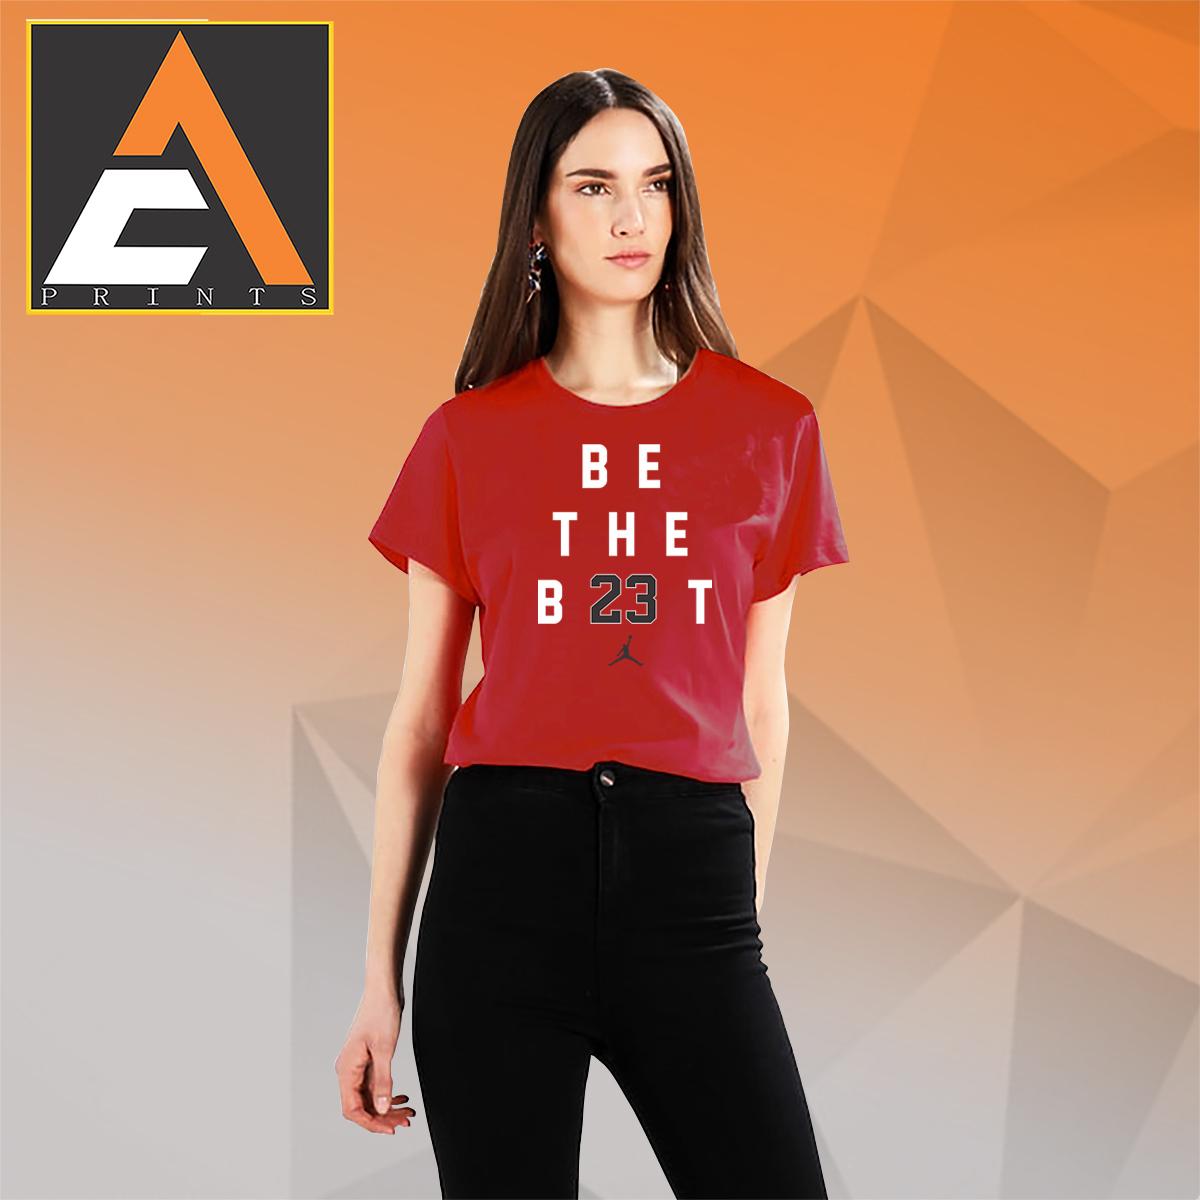 25db3cb9e6e Specifications of Jordan shirt Michael Jordan shirt Basketball tshirt  Basketball shirt AIR Shirt Unisex(Men/Women)(Male/Female)(Gildan) T-shirts  Tees T ...